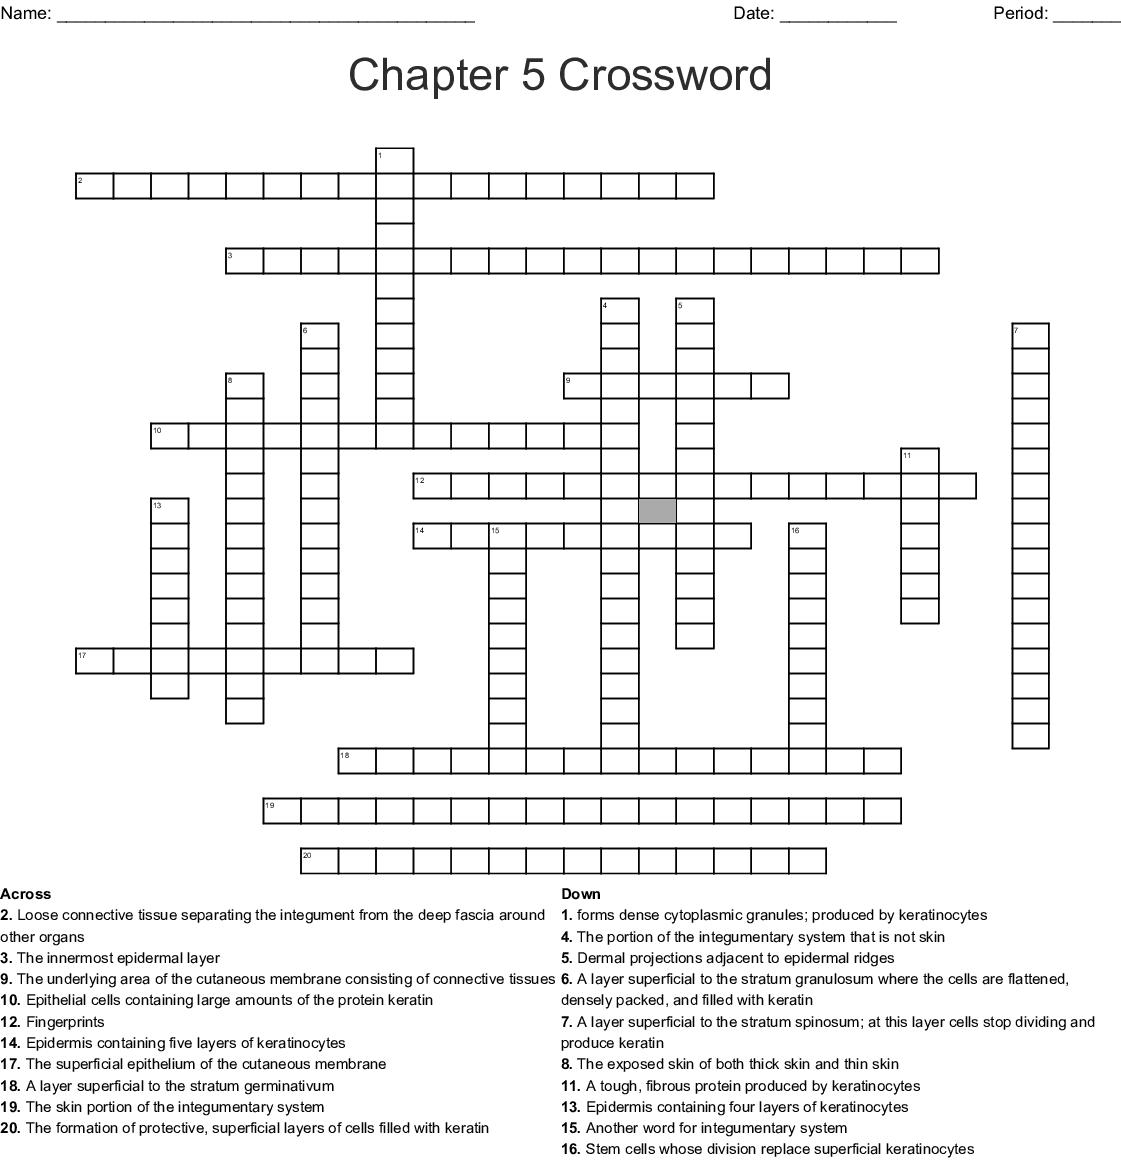 Bestseller Chapter 5 The Integumentary System Worksheet